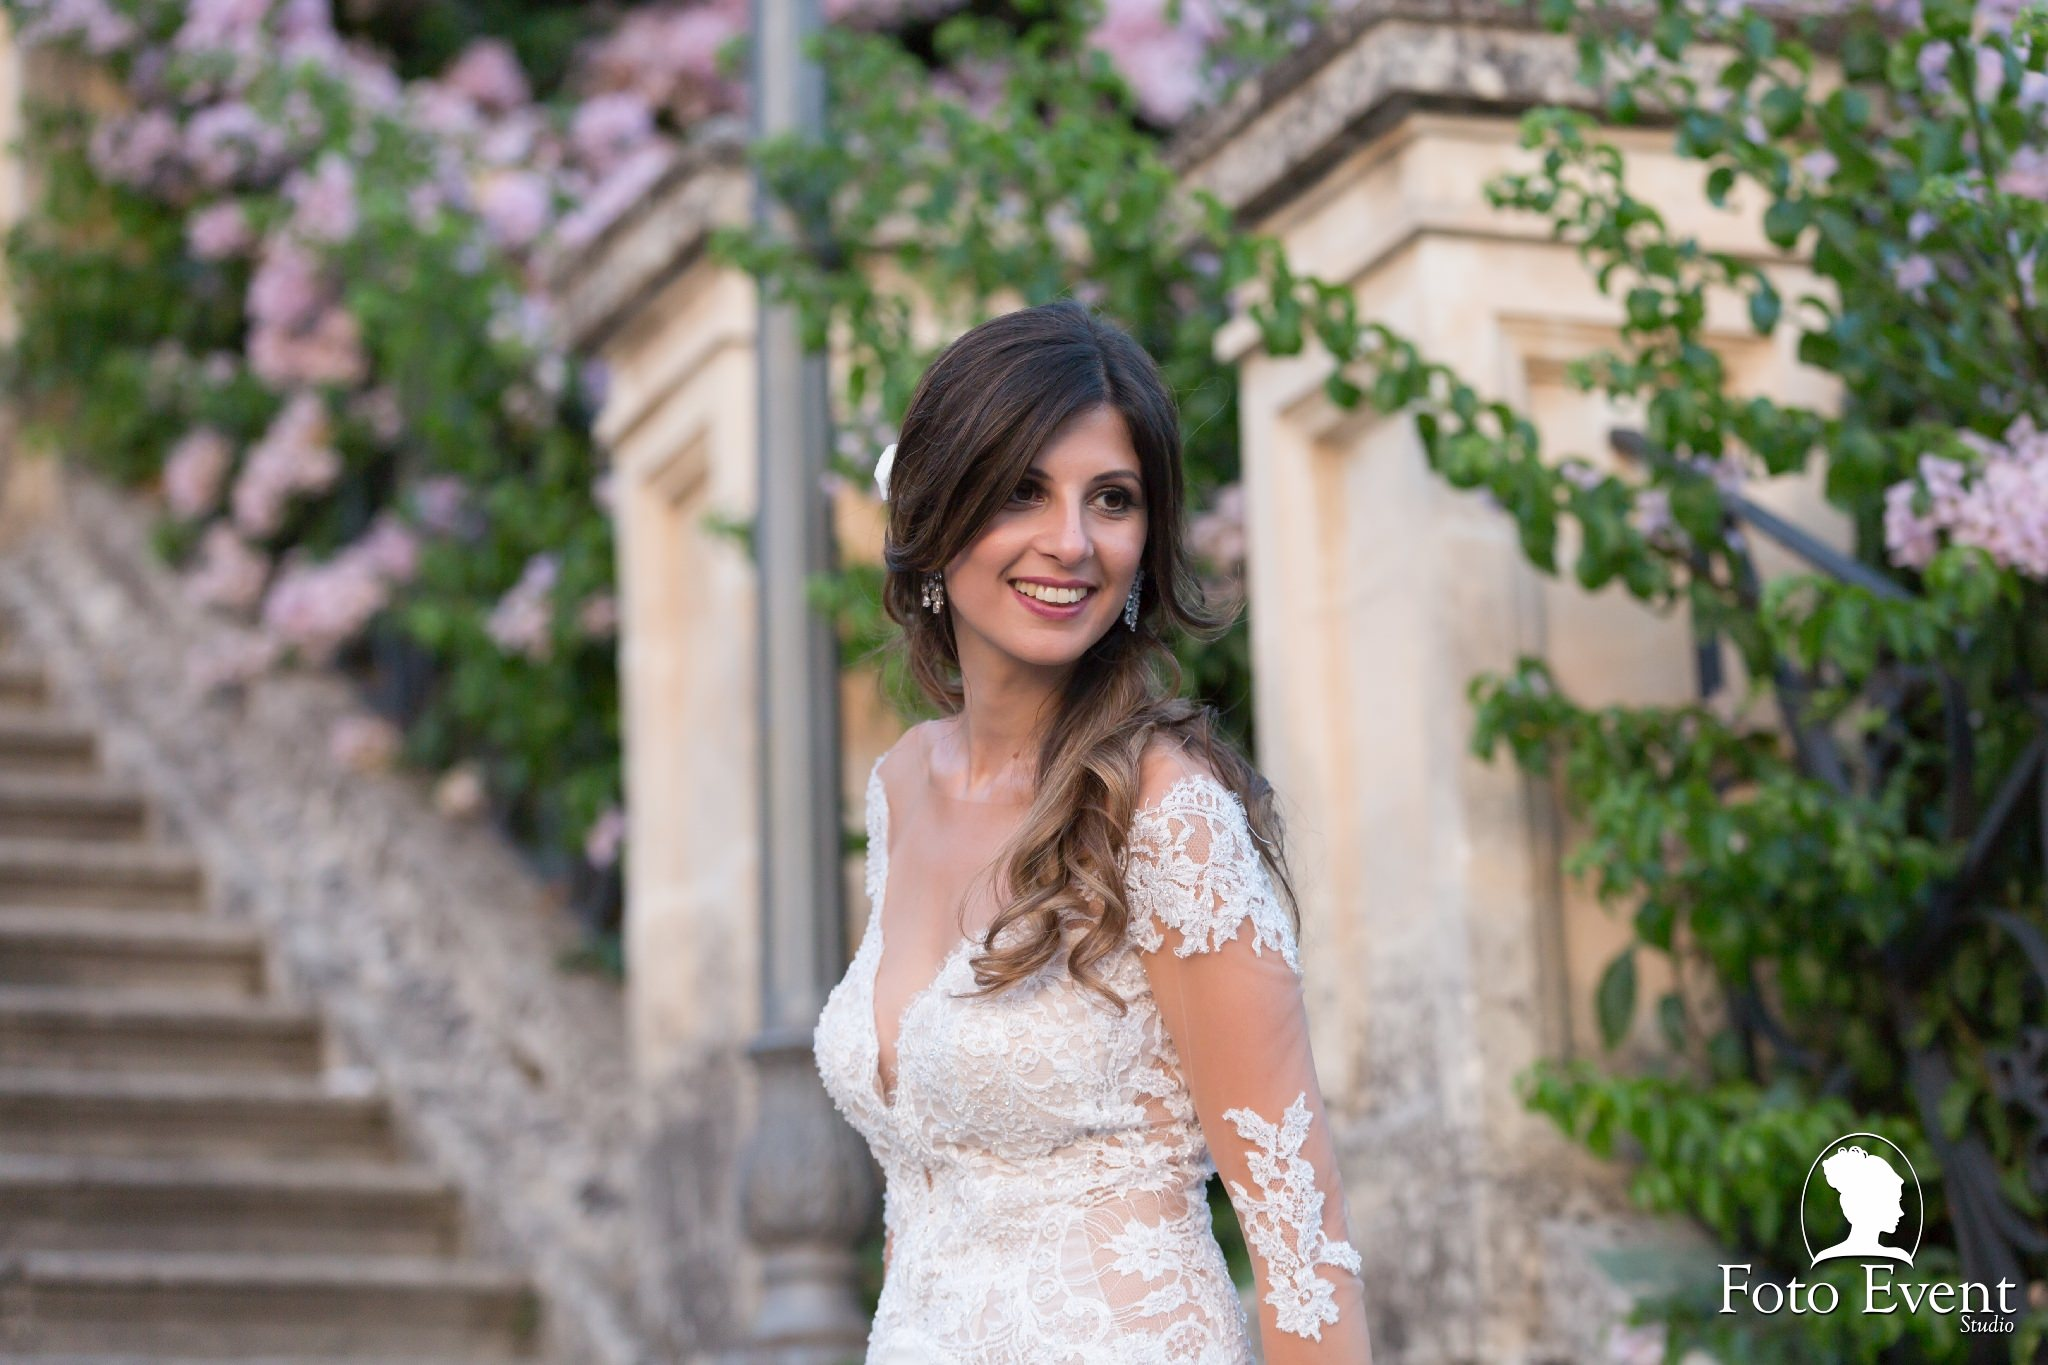 2017-07-21 Matrimonio Adriana e Giuseppe Dorsi zoom 280 CD FOTO